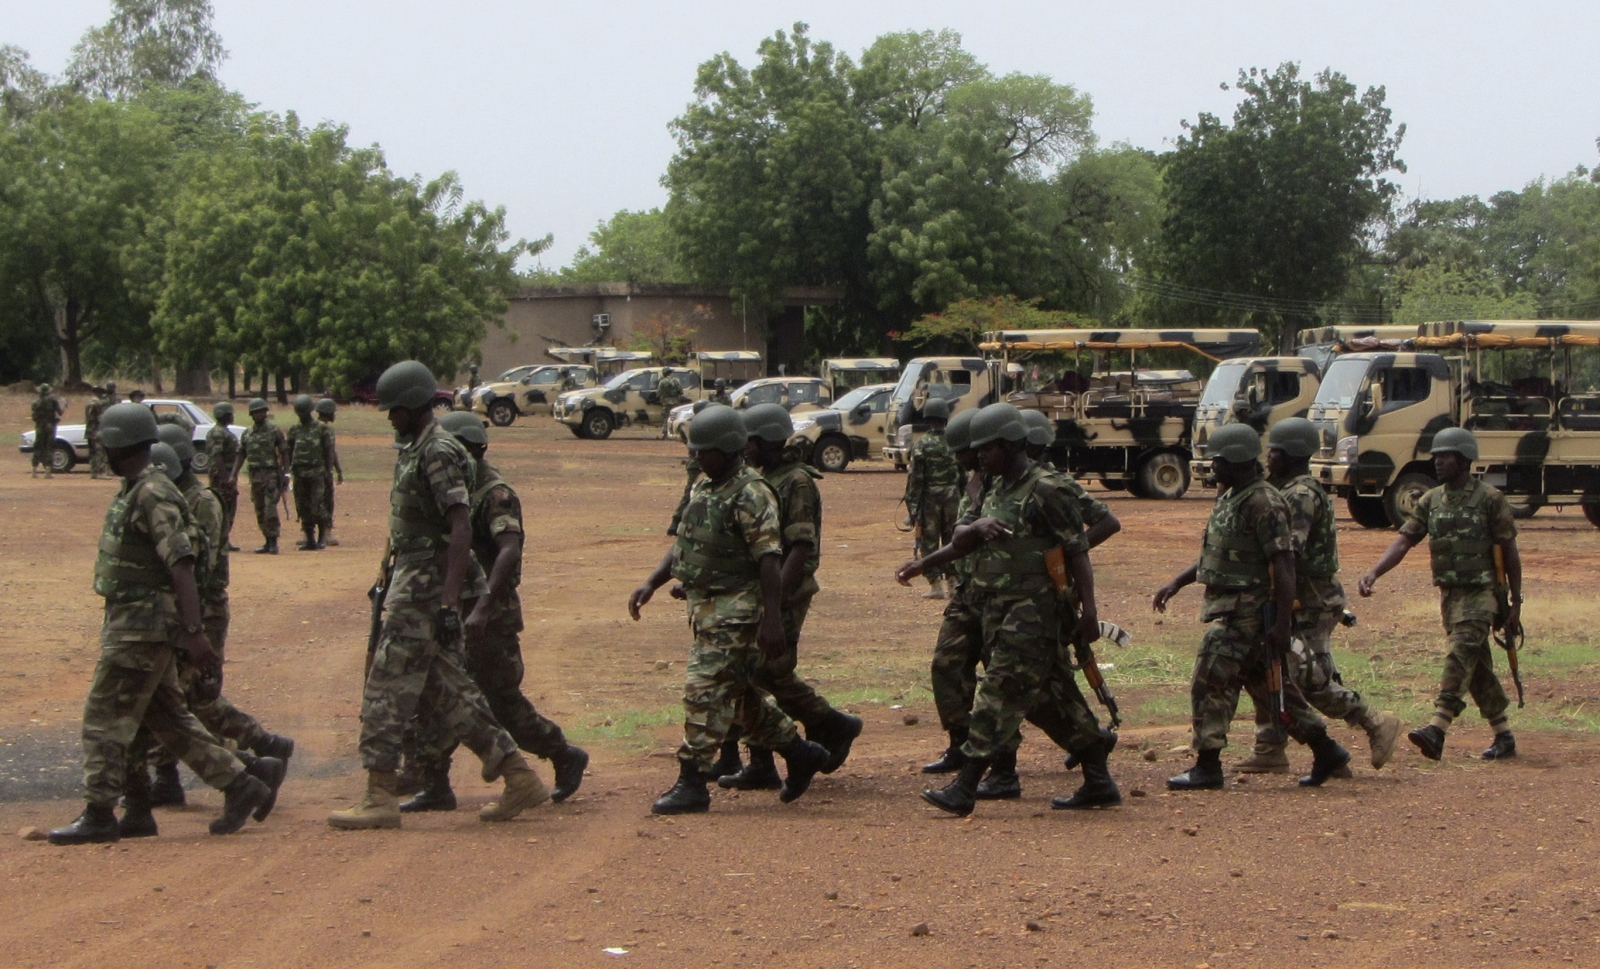 AU troops in Nigeria to fight Boko Haram